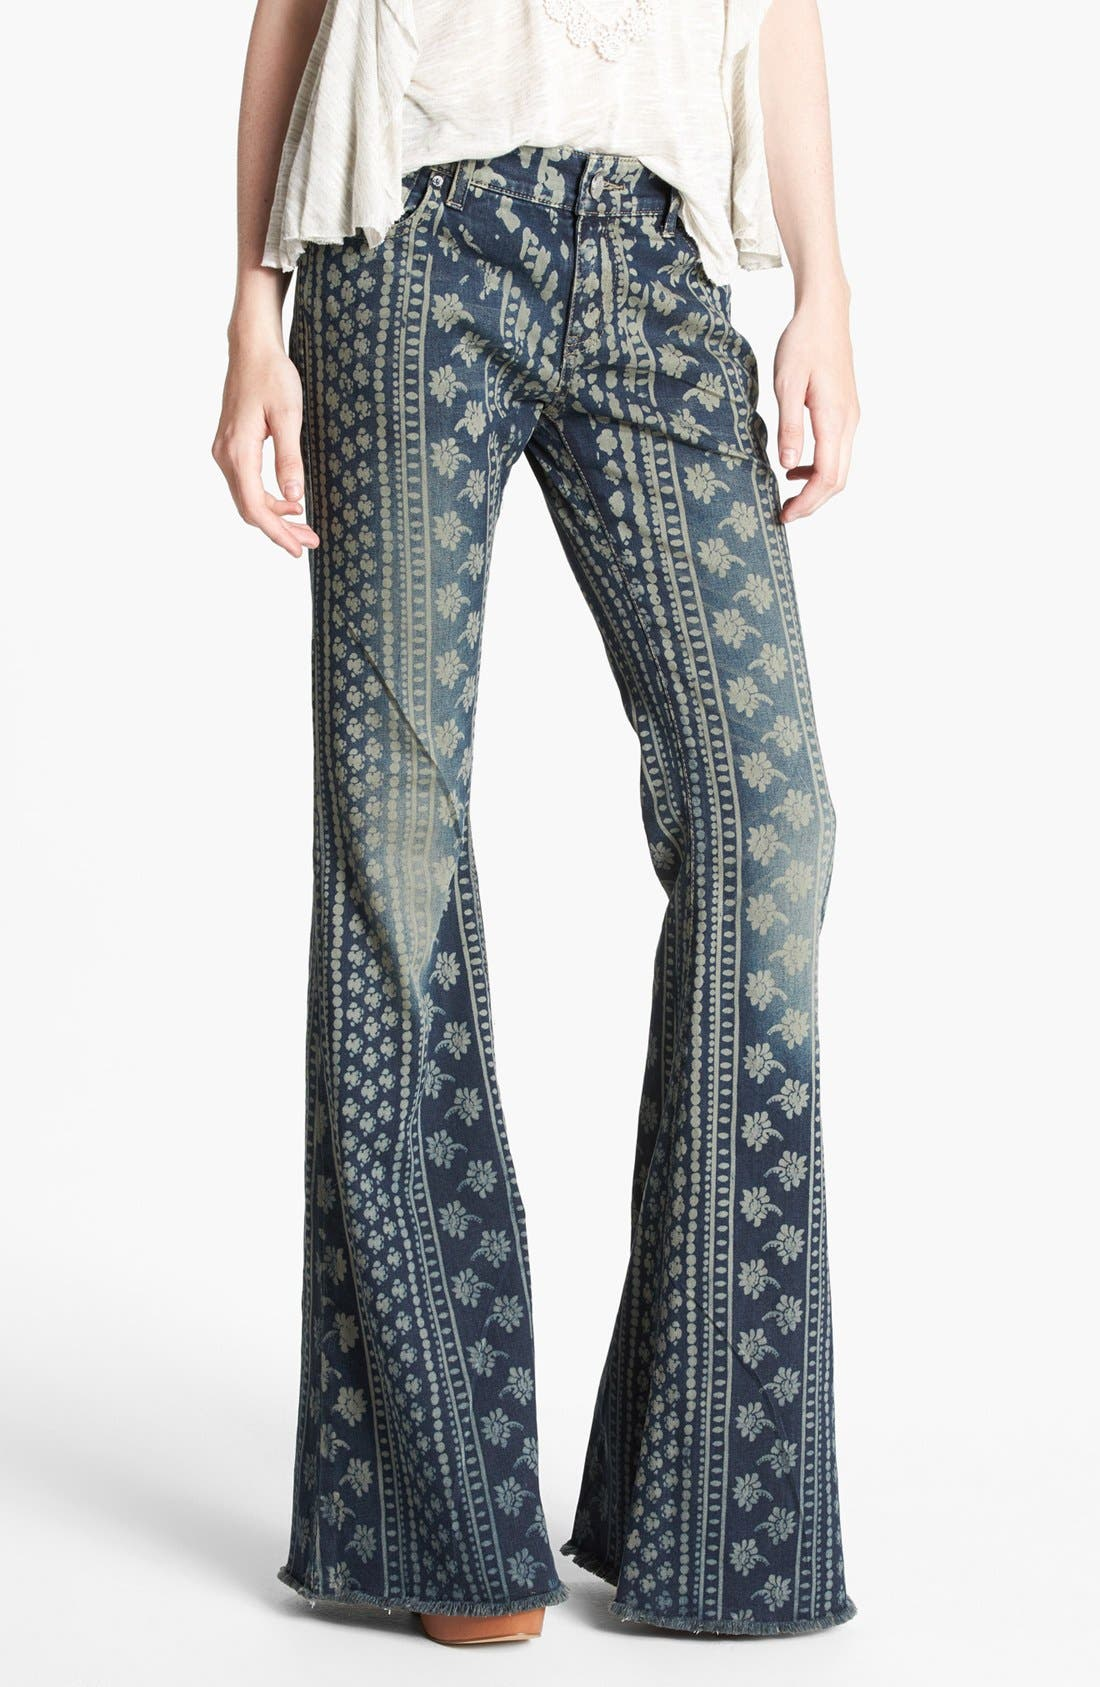 Main Image - Free People 'Bali' Print Flare Leg Jeans (Indigo Combo)